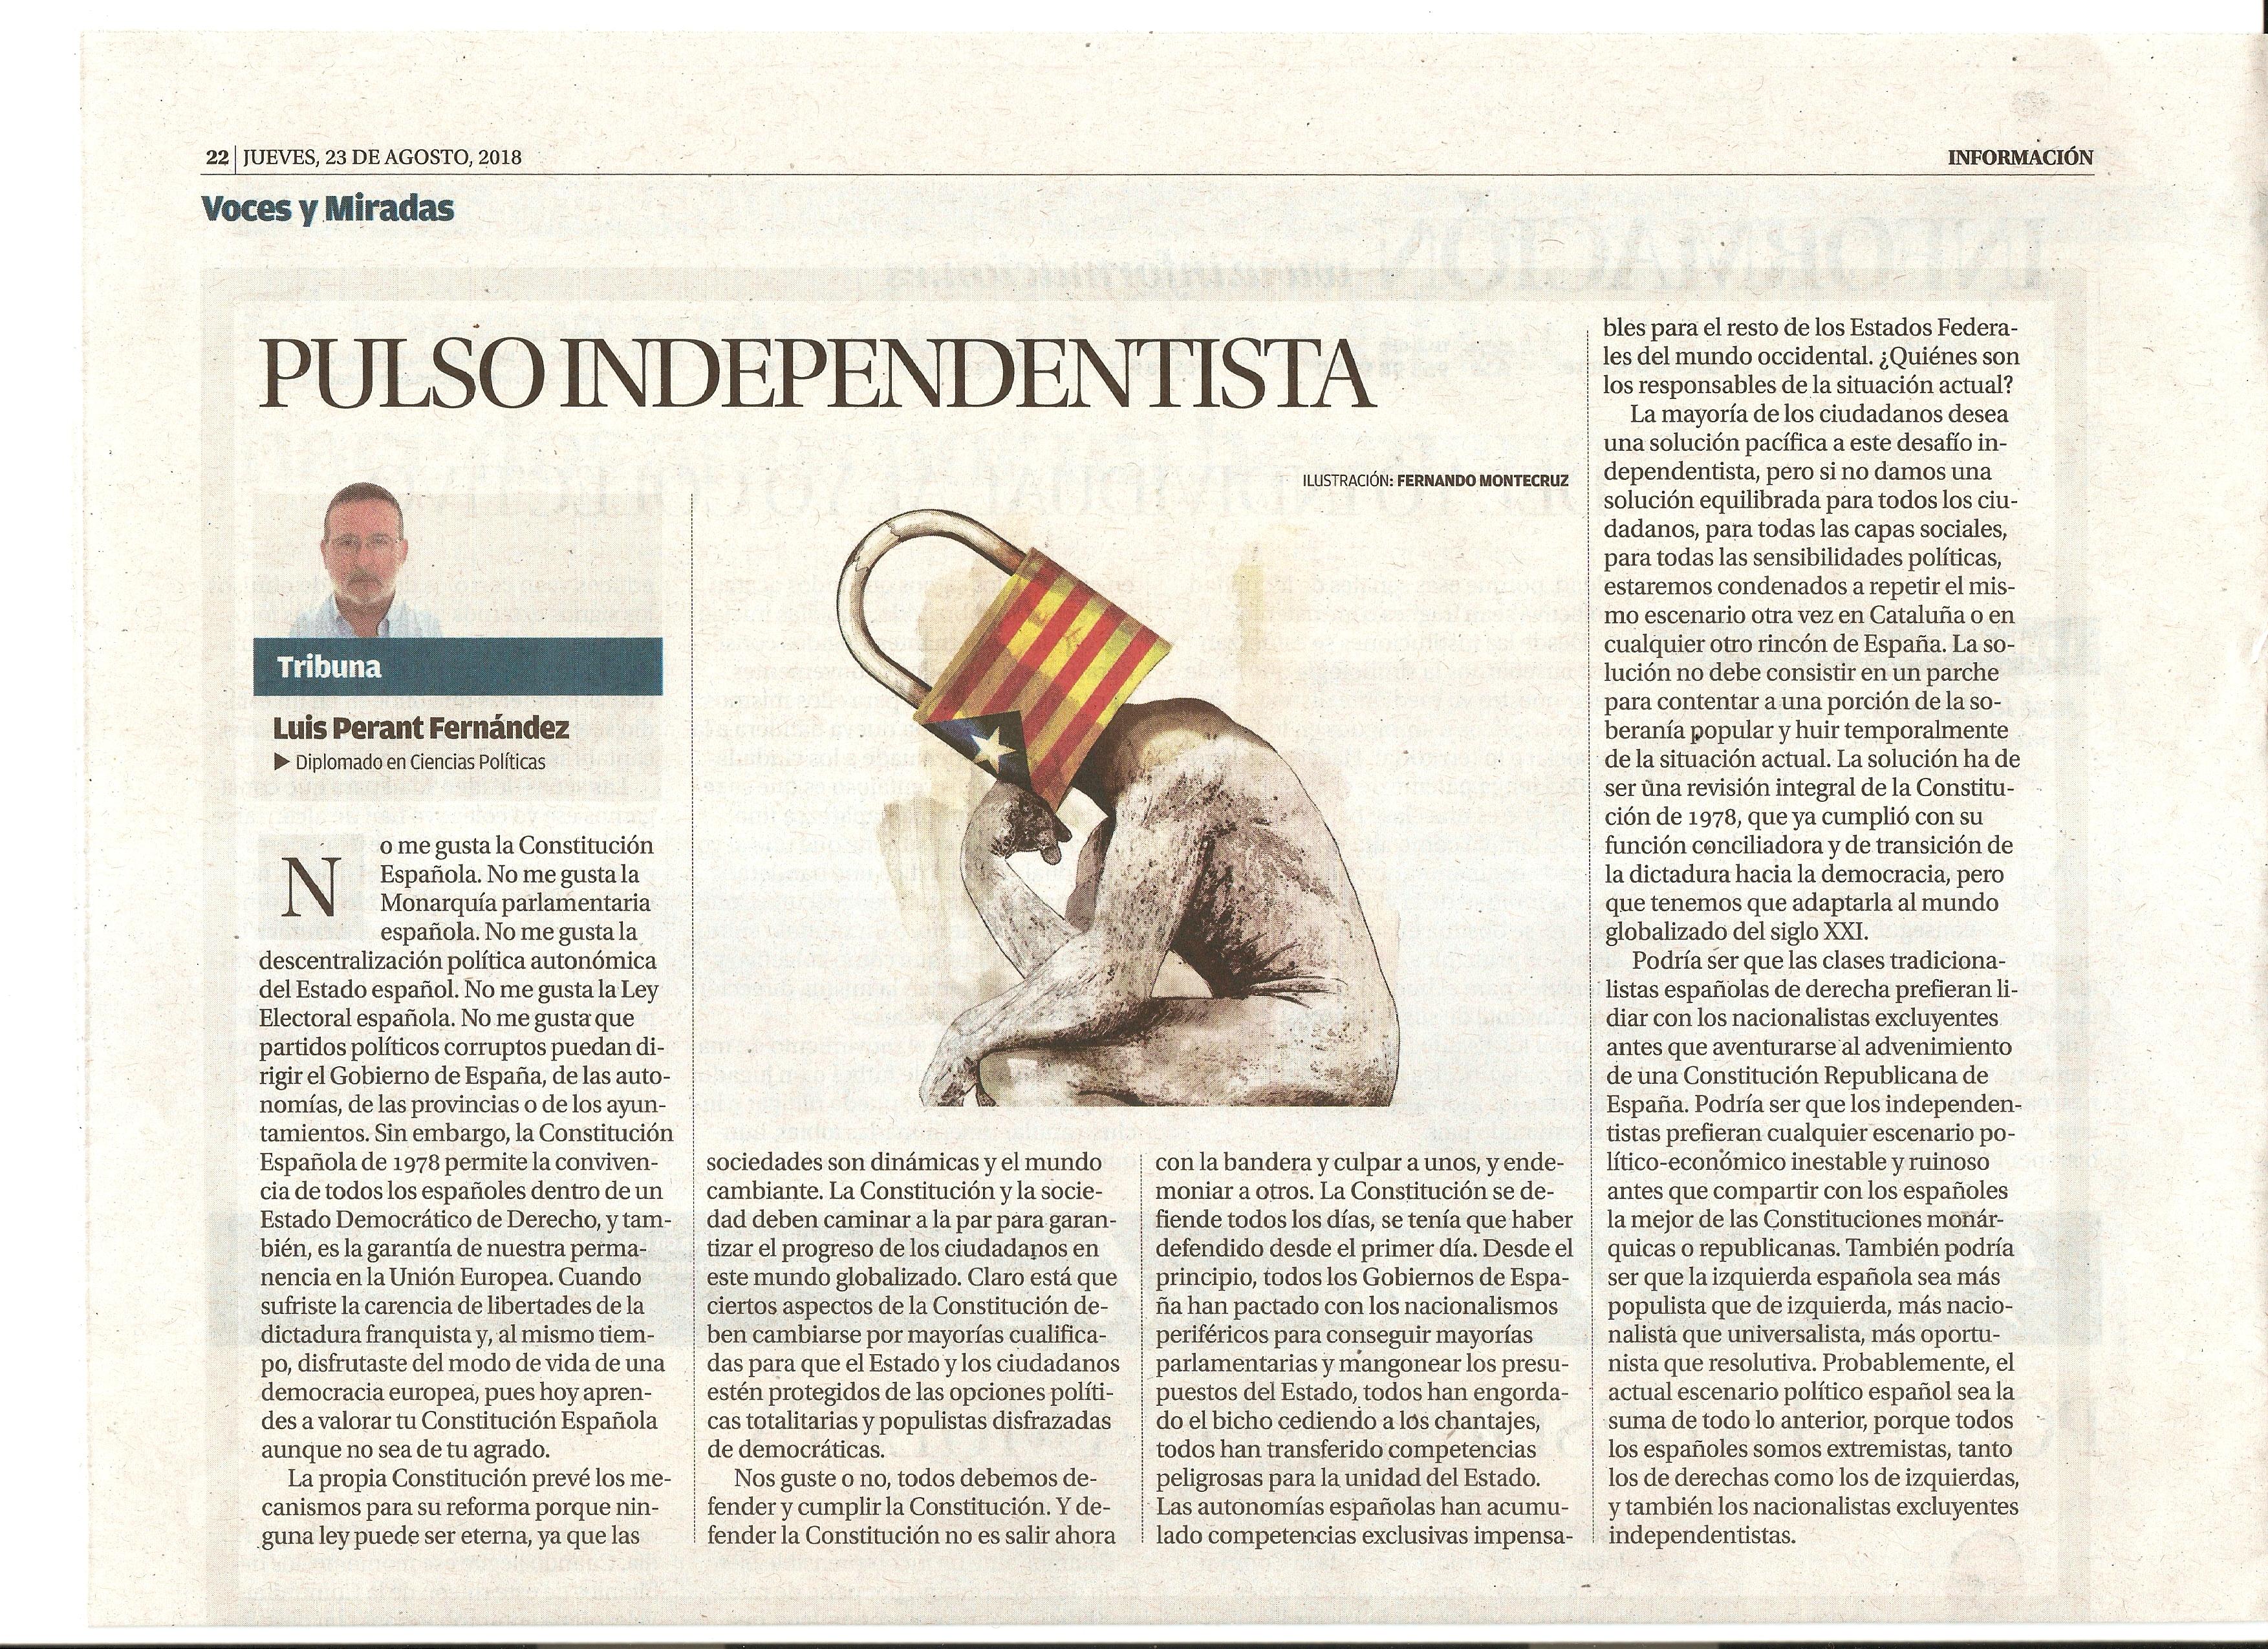 Pulso Independentista